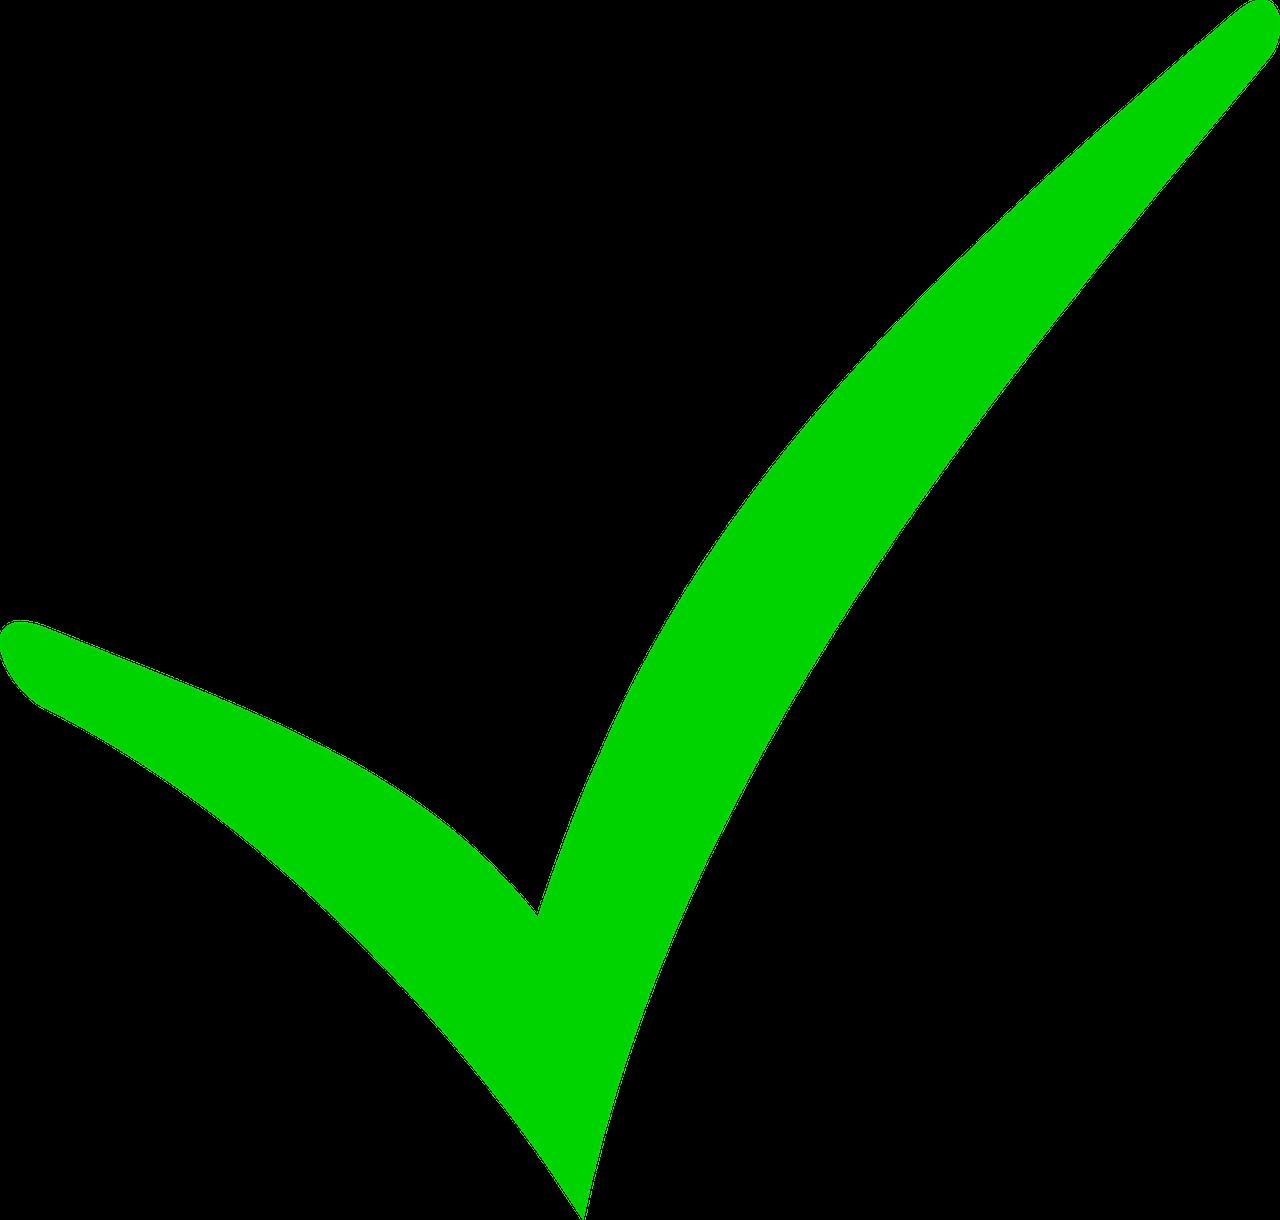 Powerpoint grüner haken | HAken symbol. 2020-05-20